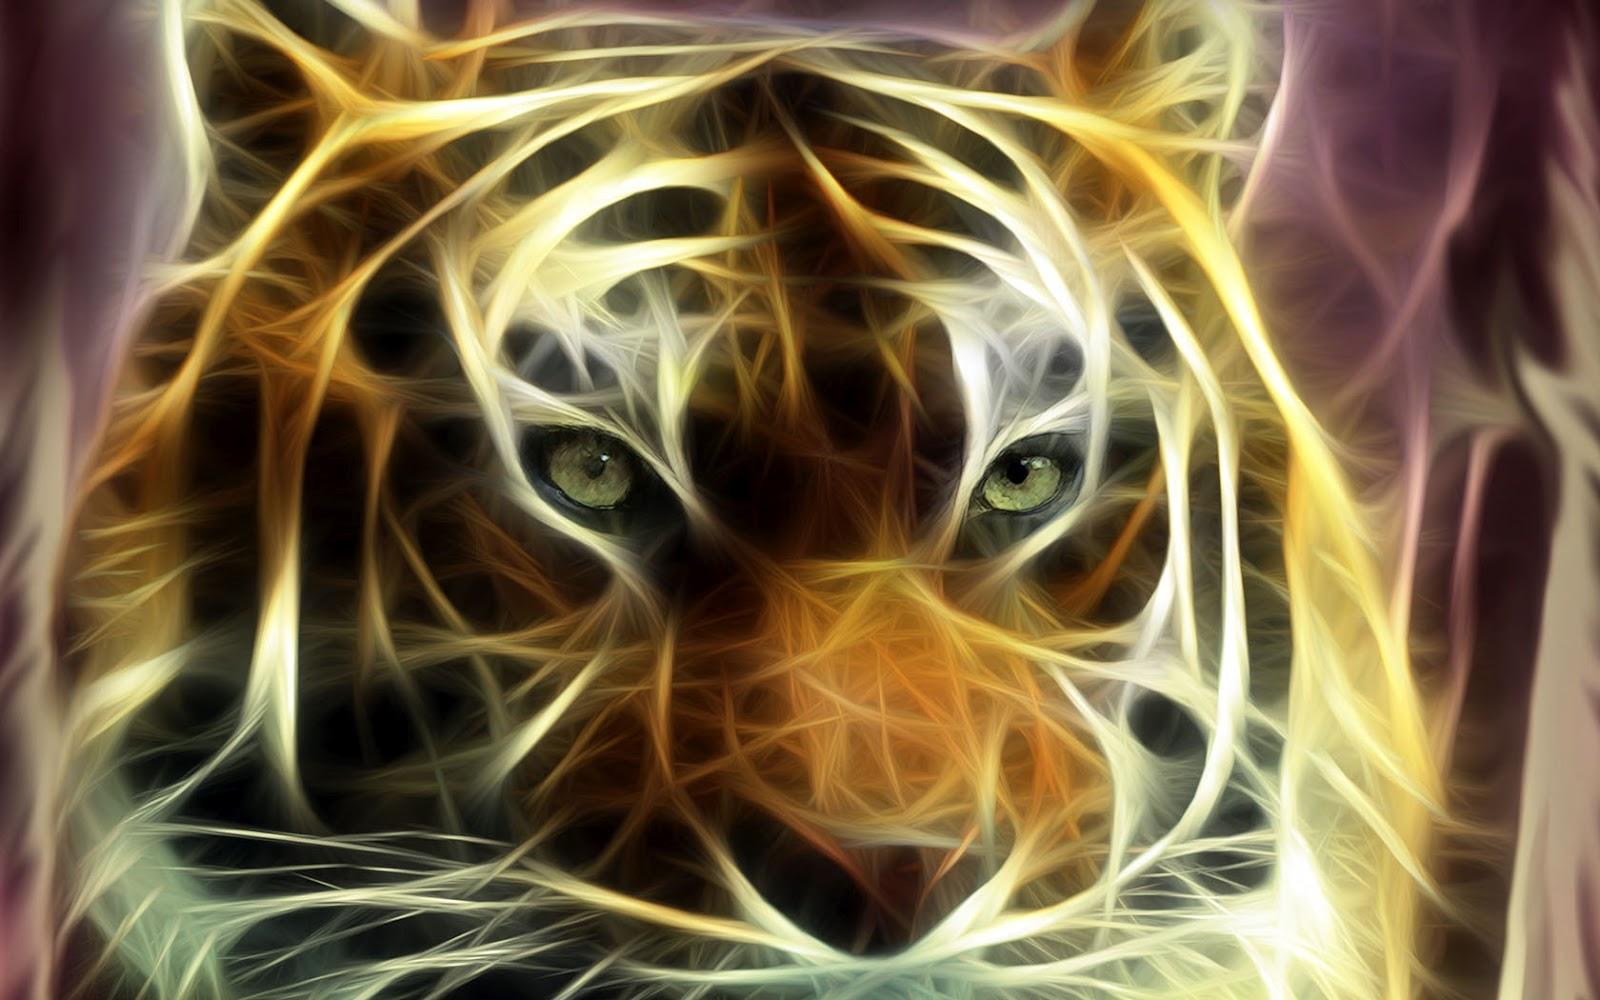 Wallpapers - HD Desktop Wallpapers Free Online: Fire ...